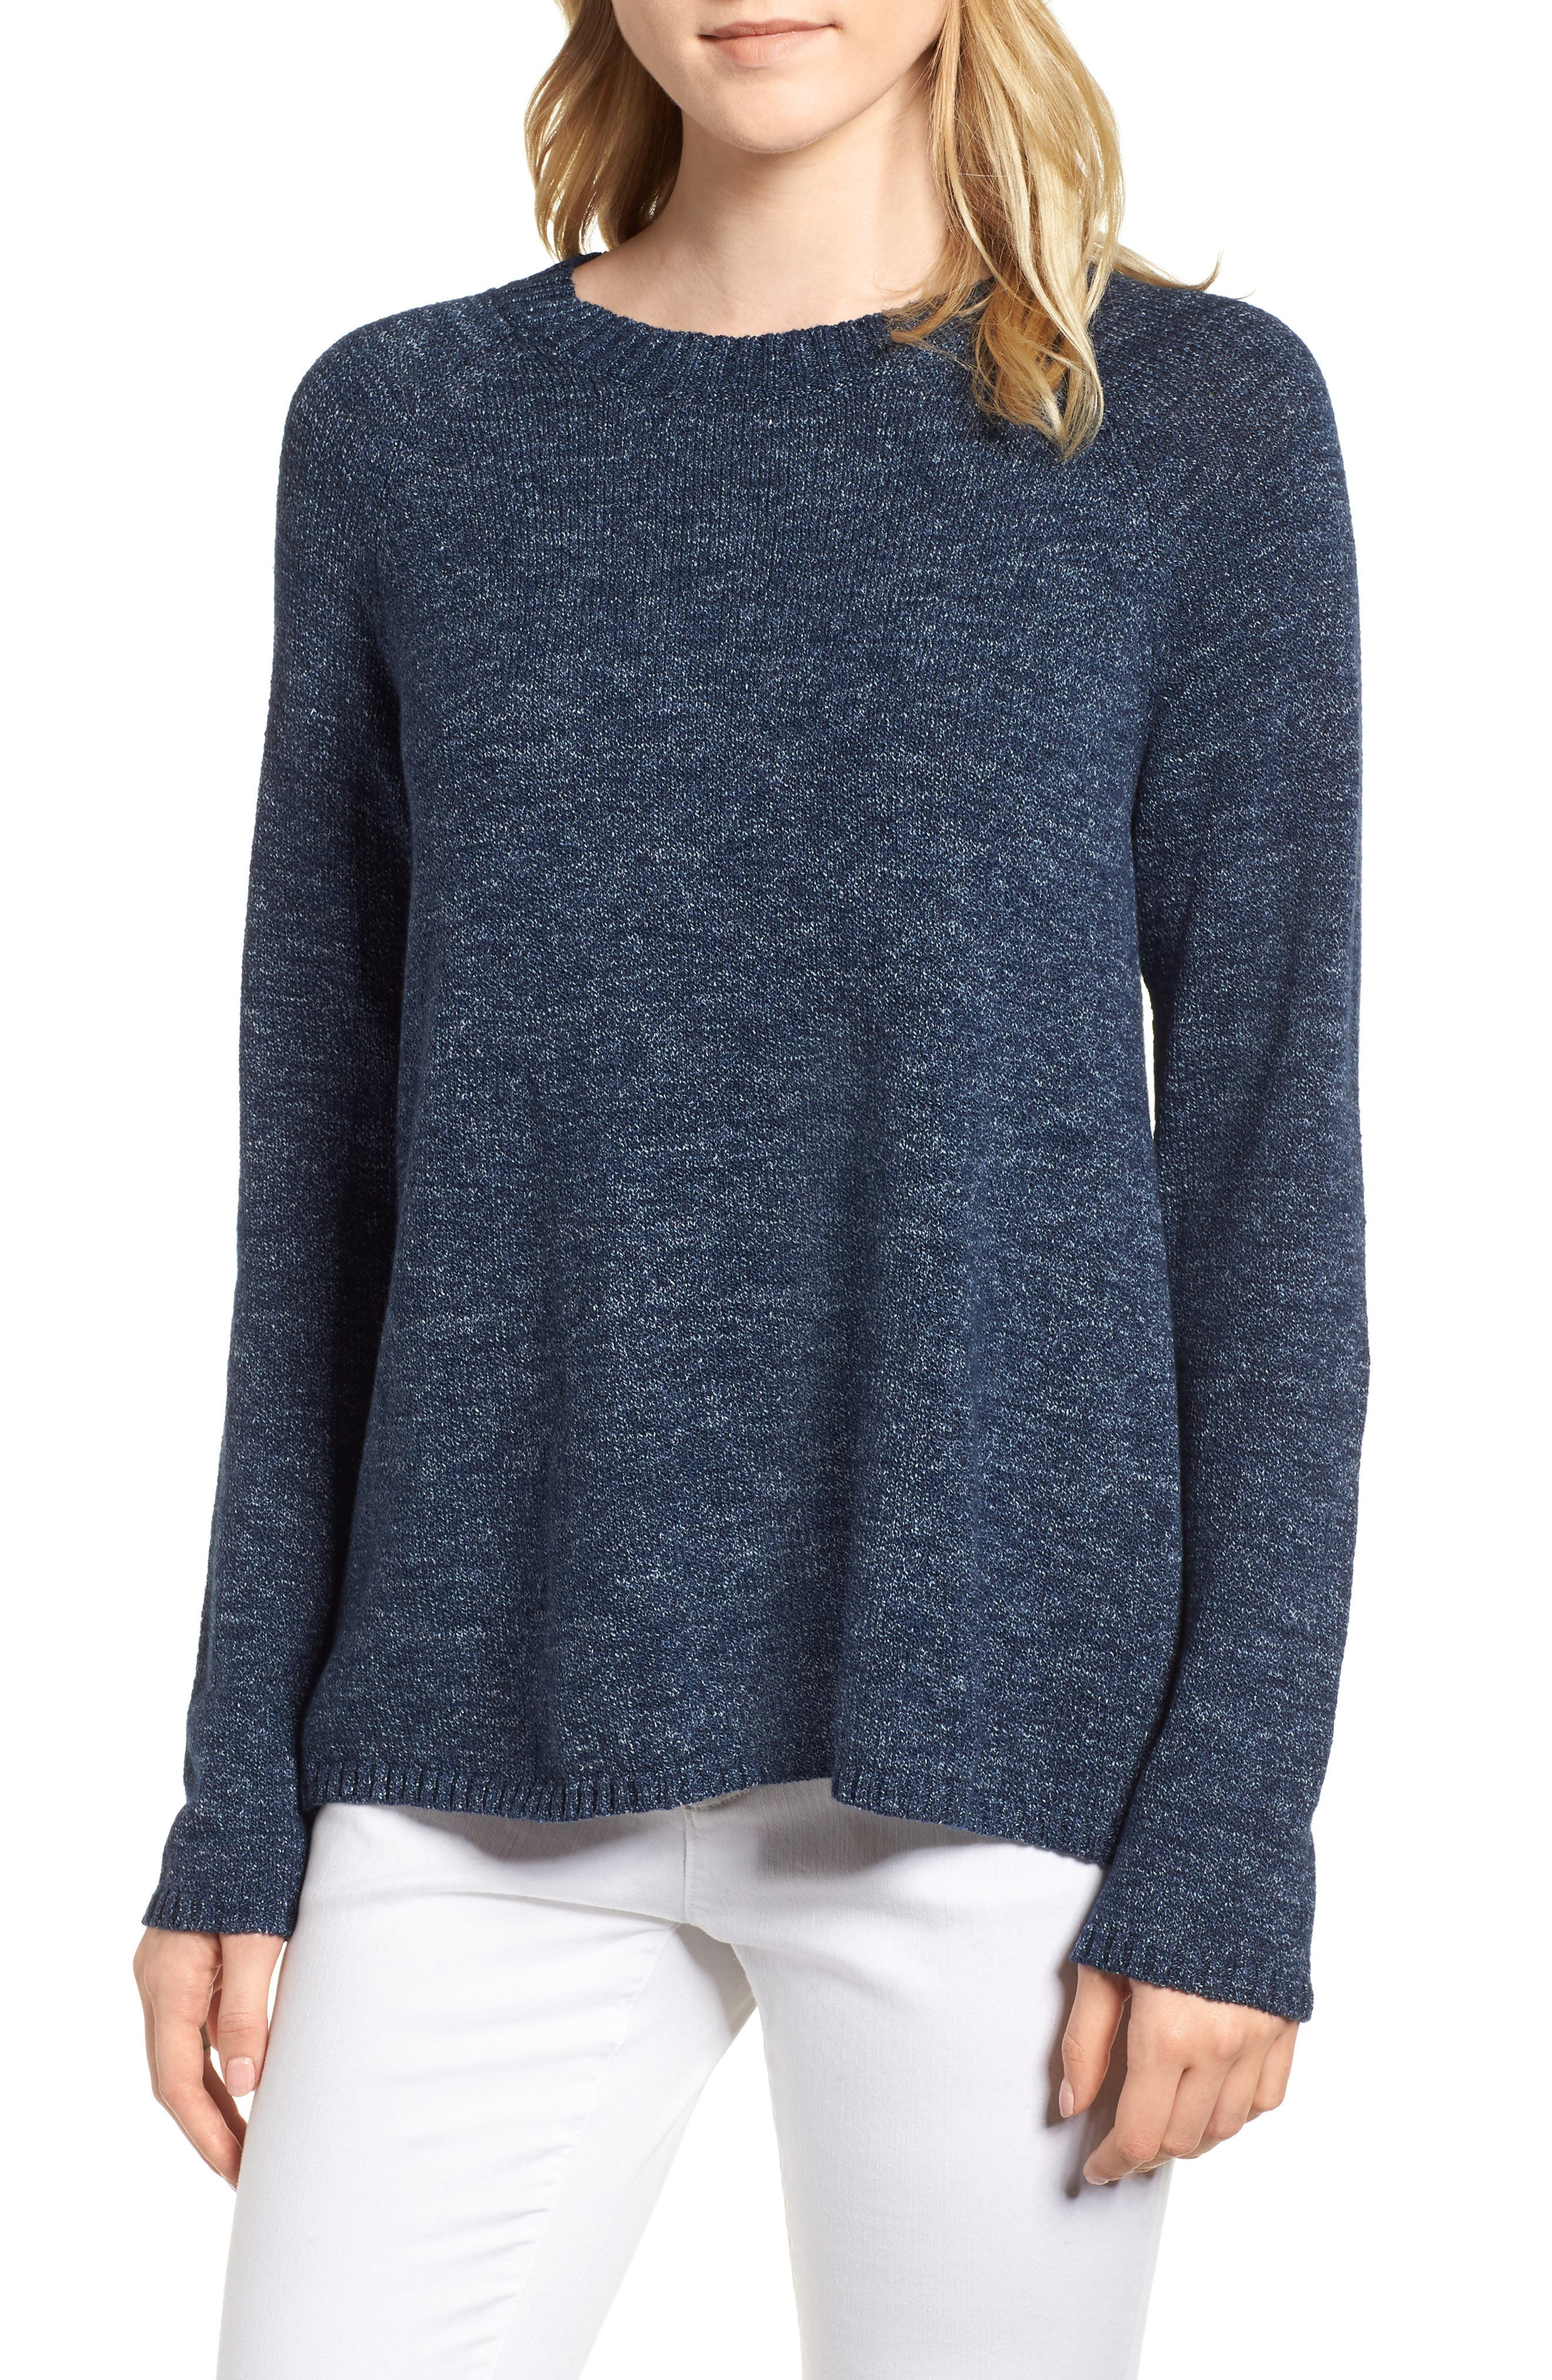 Organic Cotton Sweater,                         Main,                         color, 480